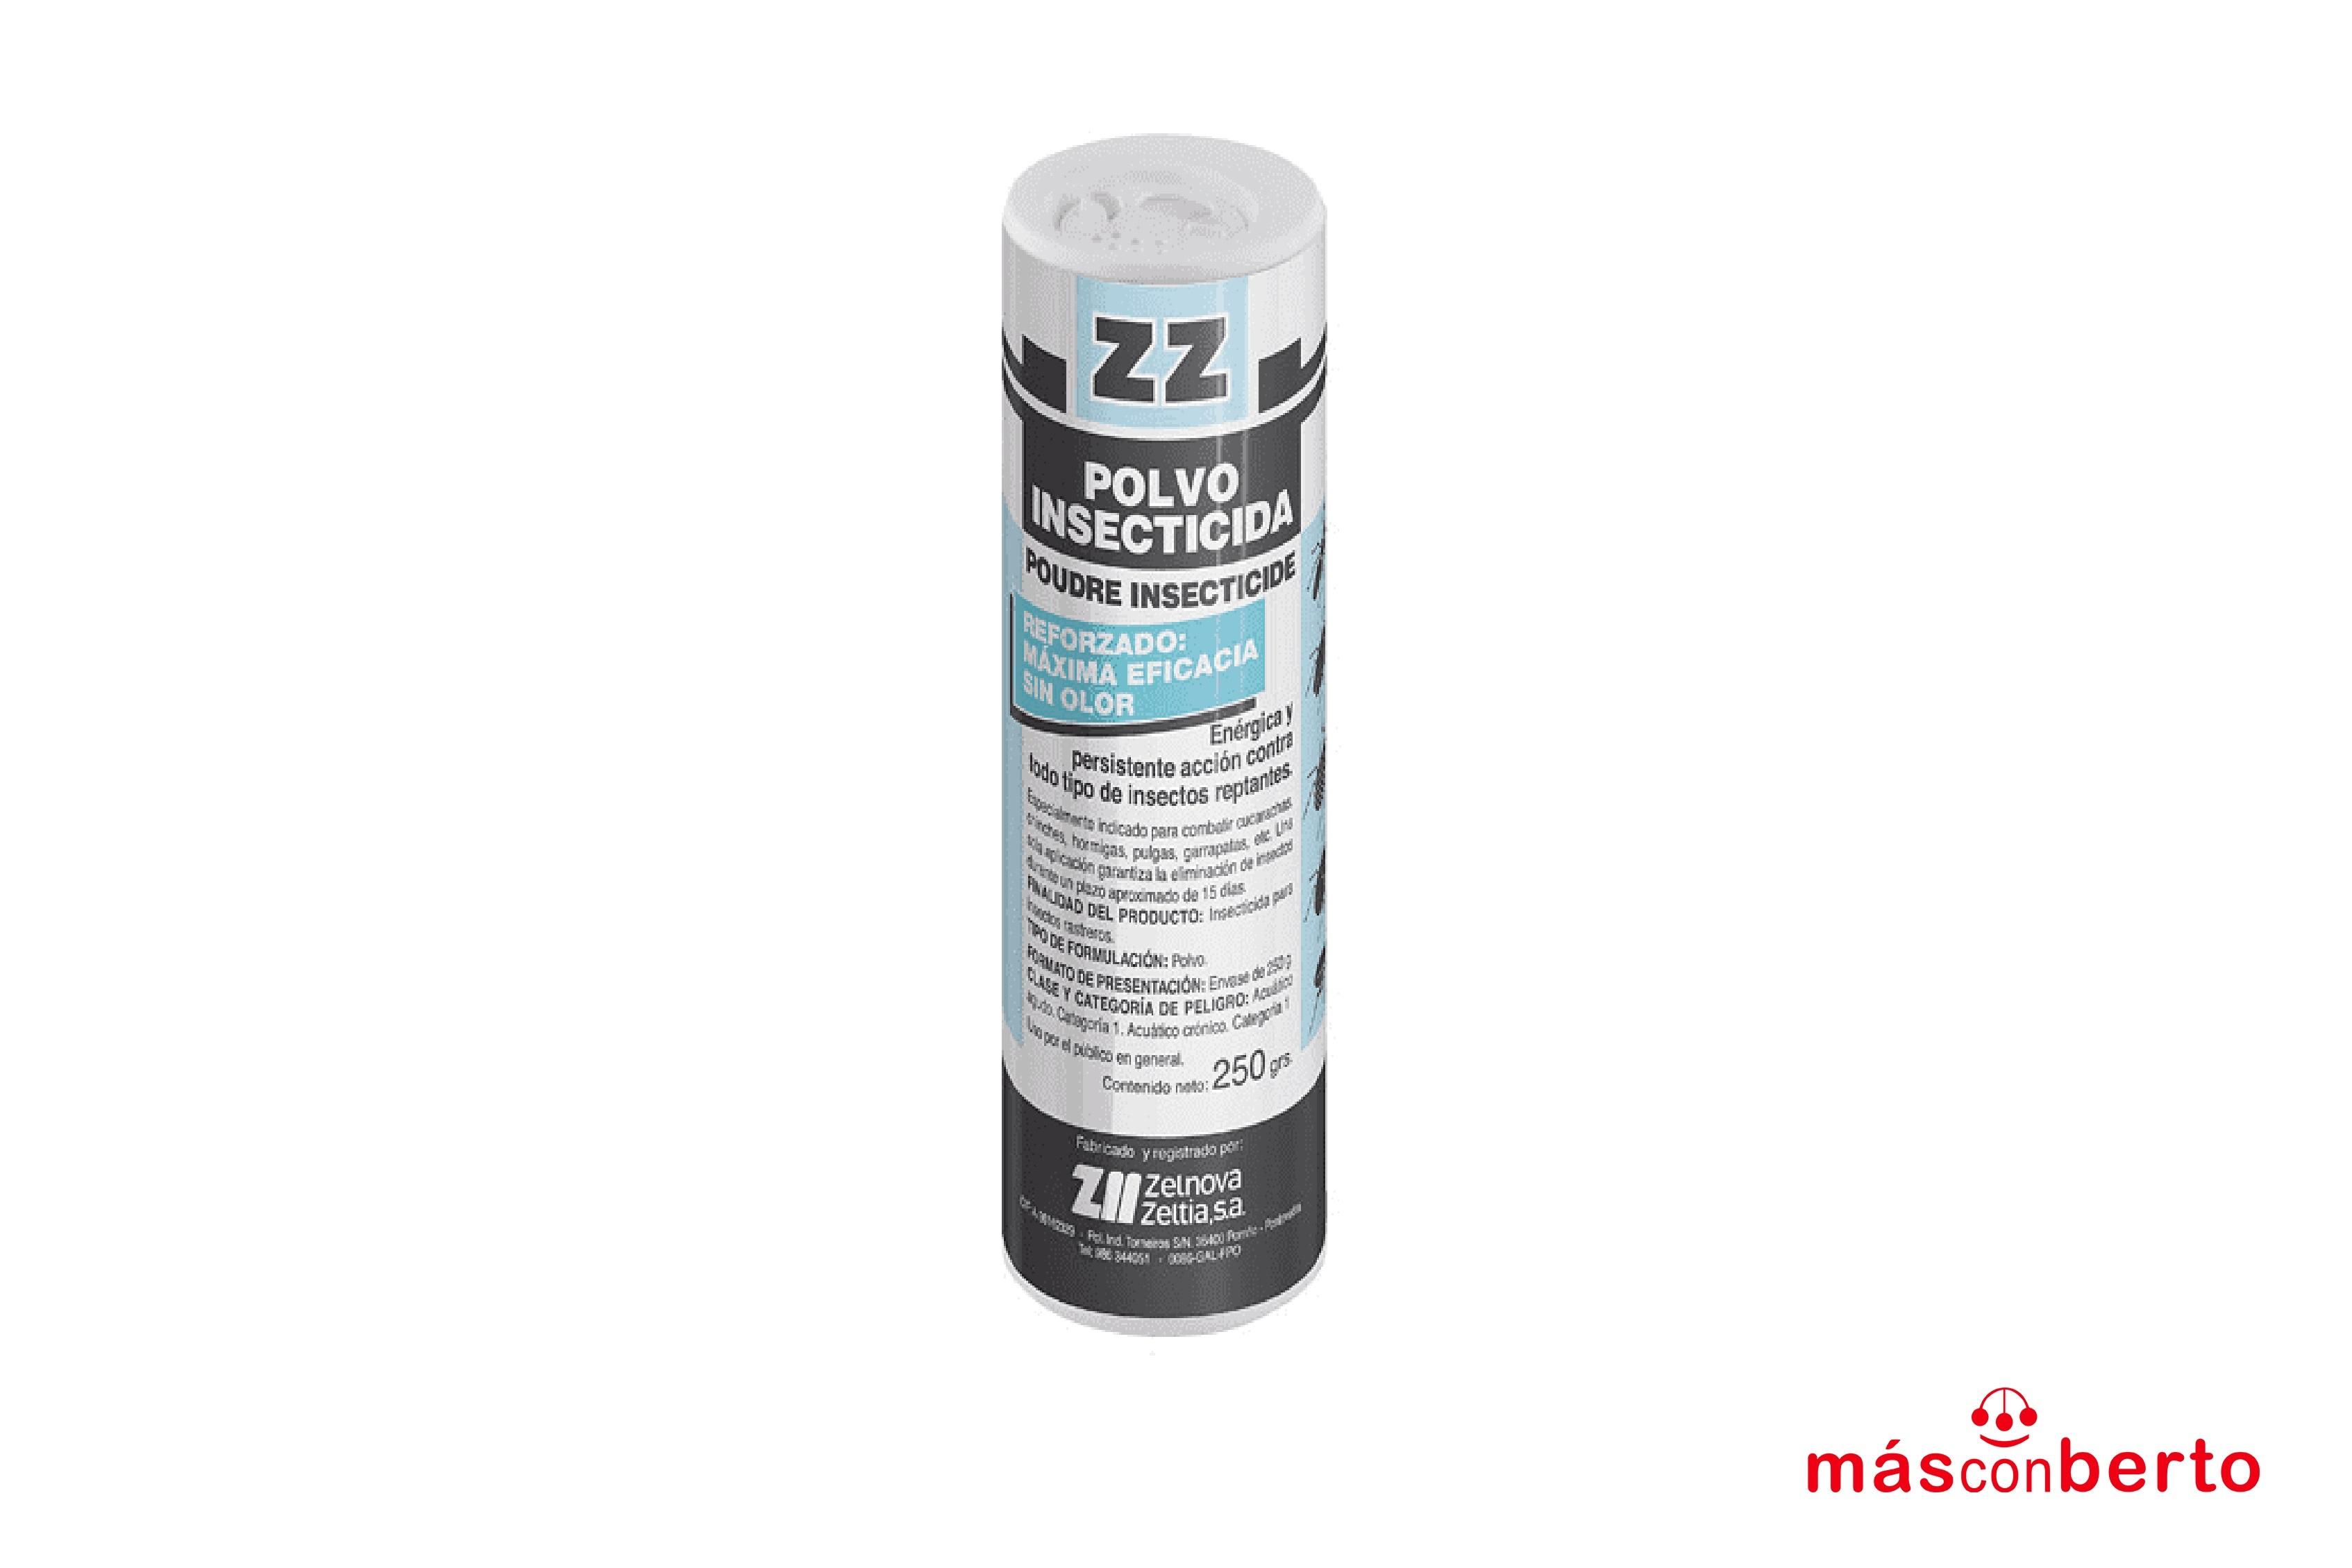 Insecticida ZZ polvos...